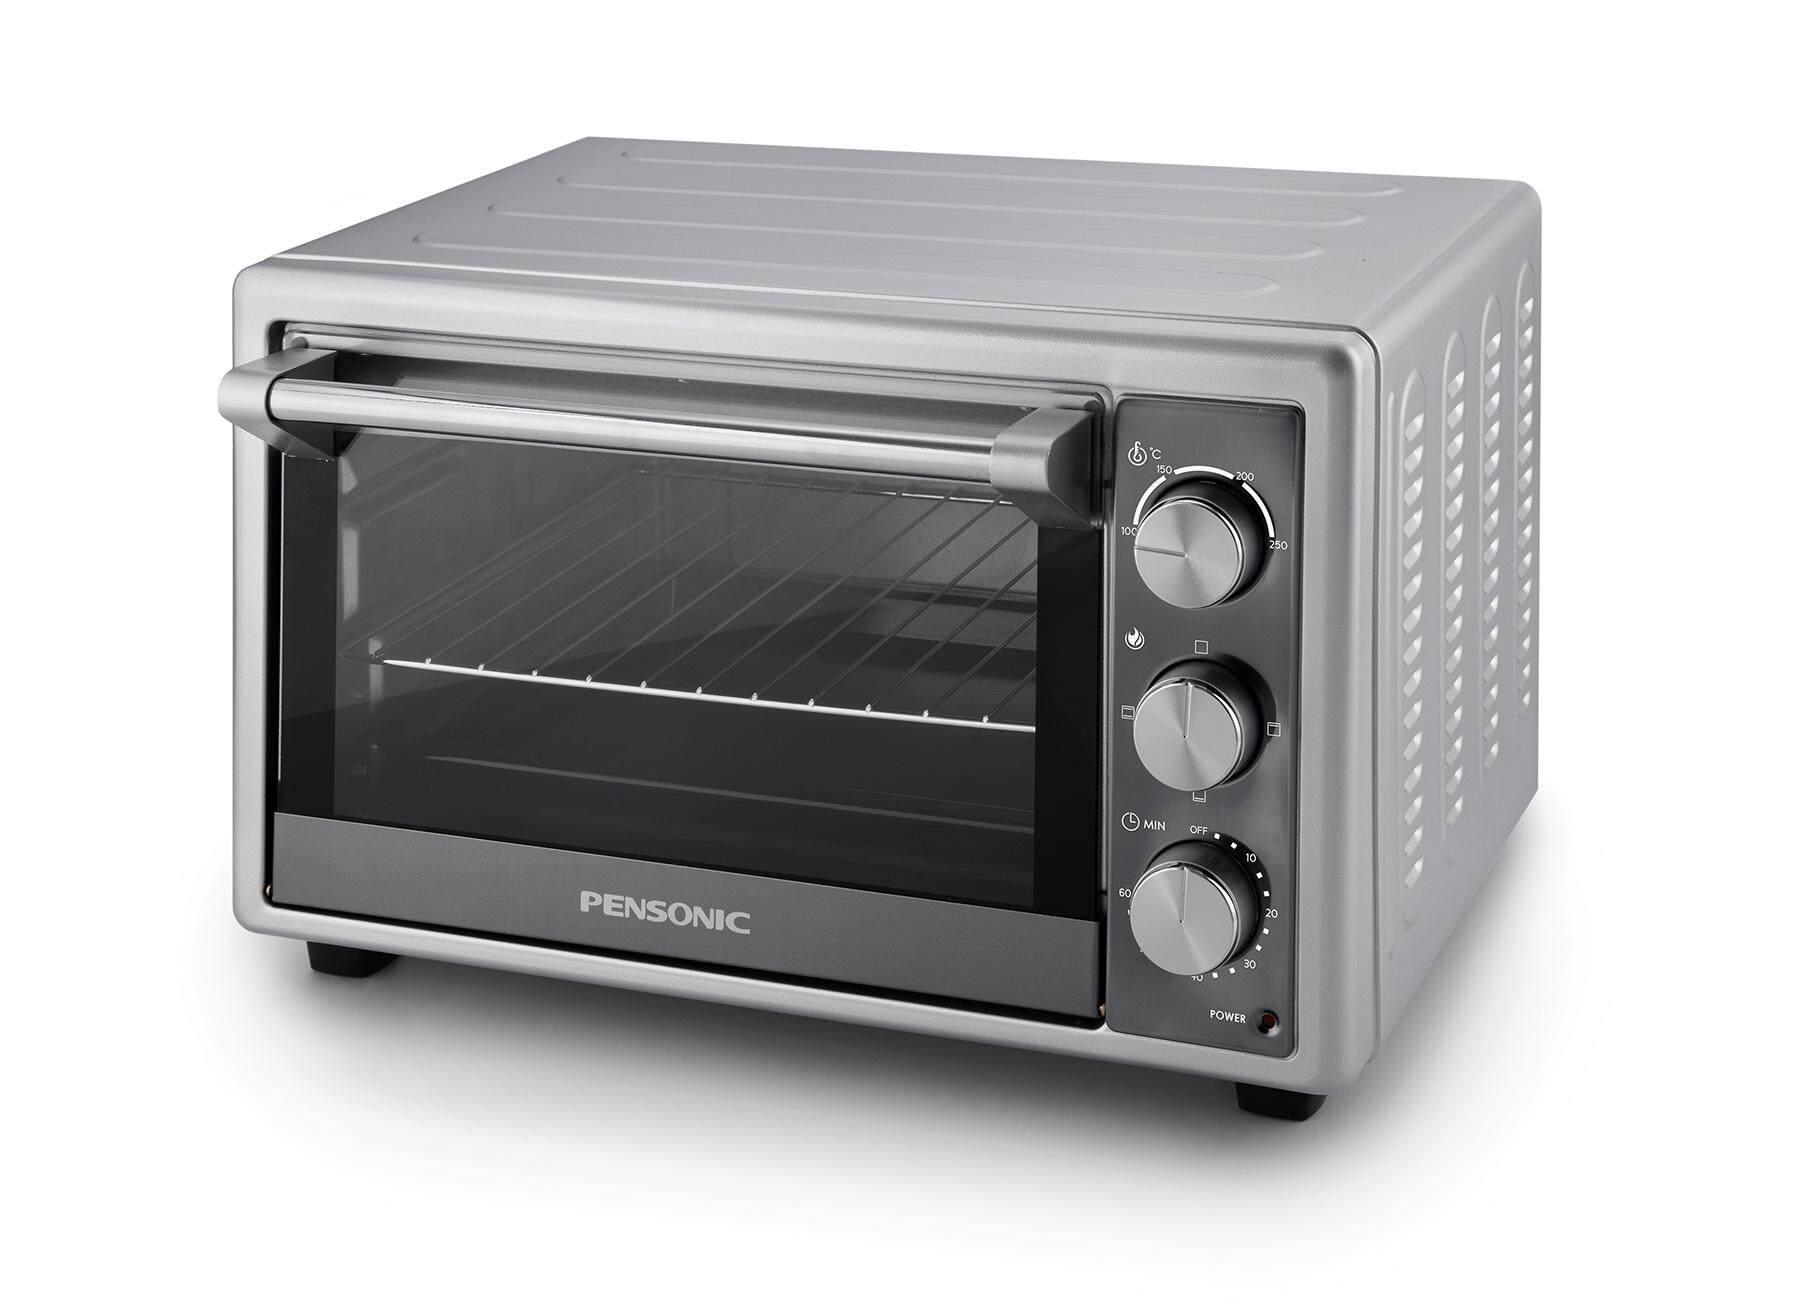 Pensonic 23l Electric Oven Peo 2304